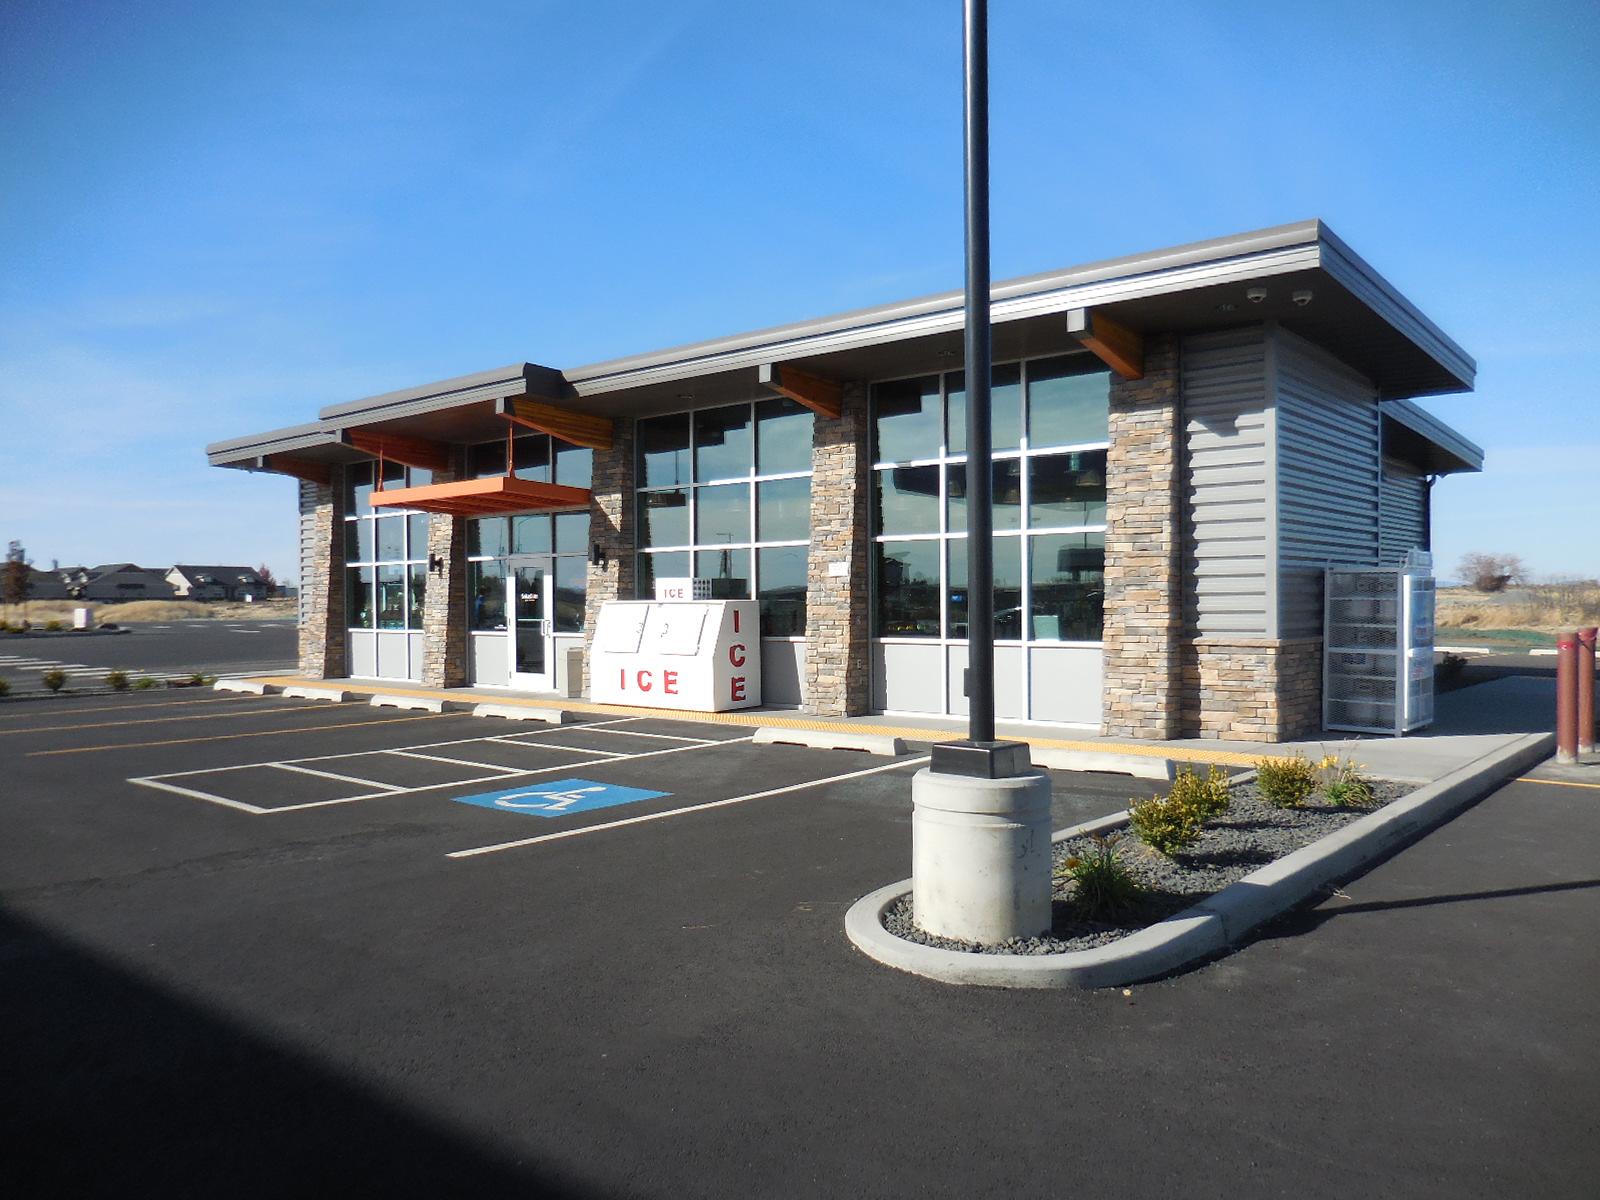 Exterior / Architecture / Storefront